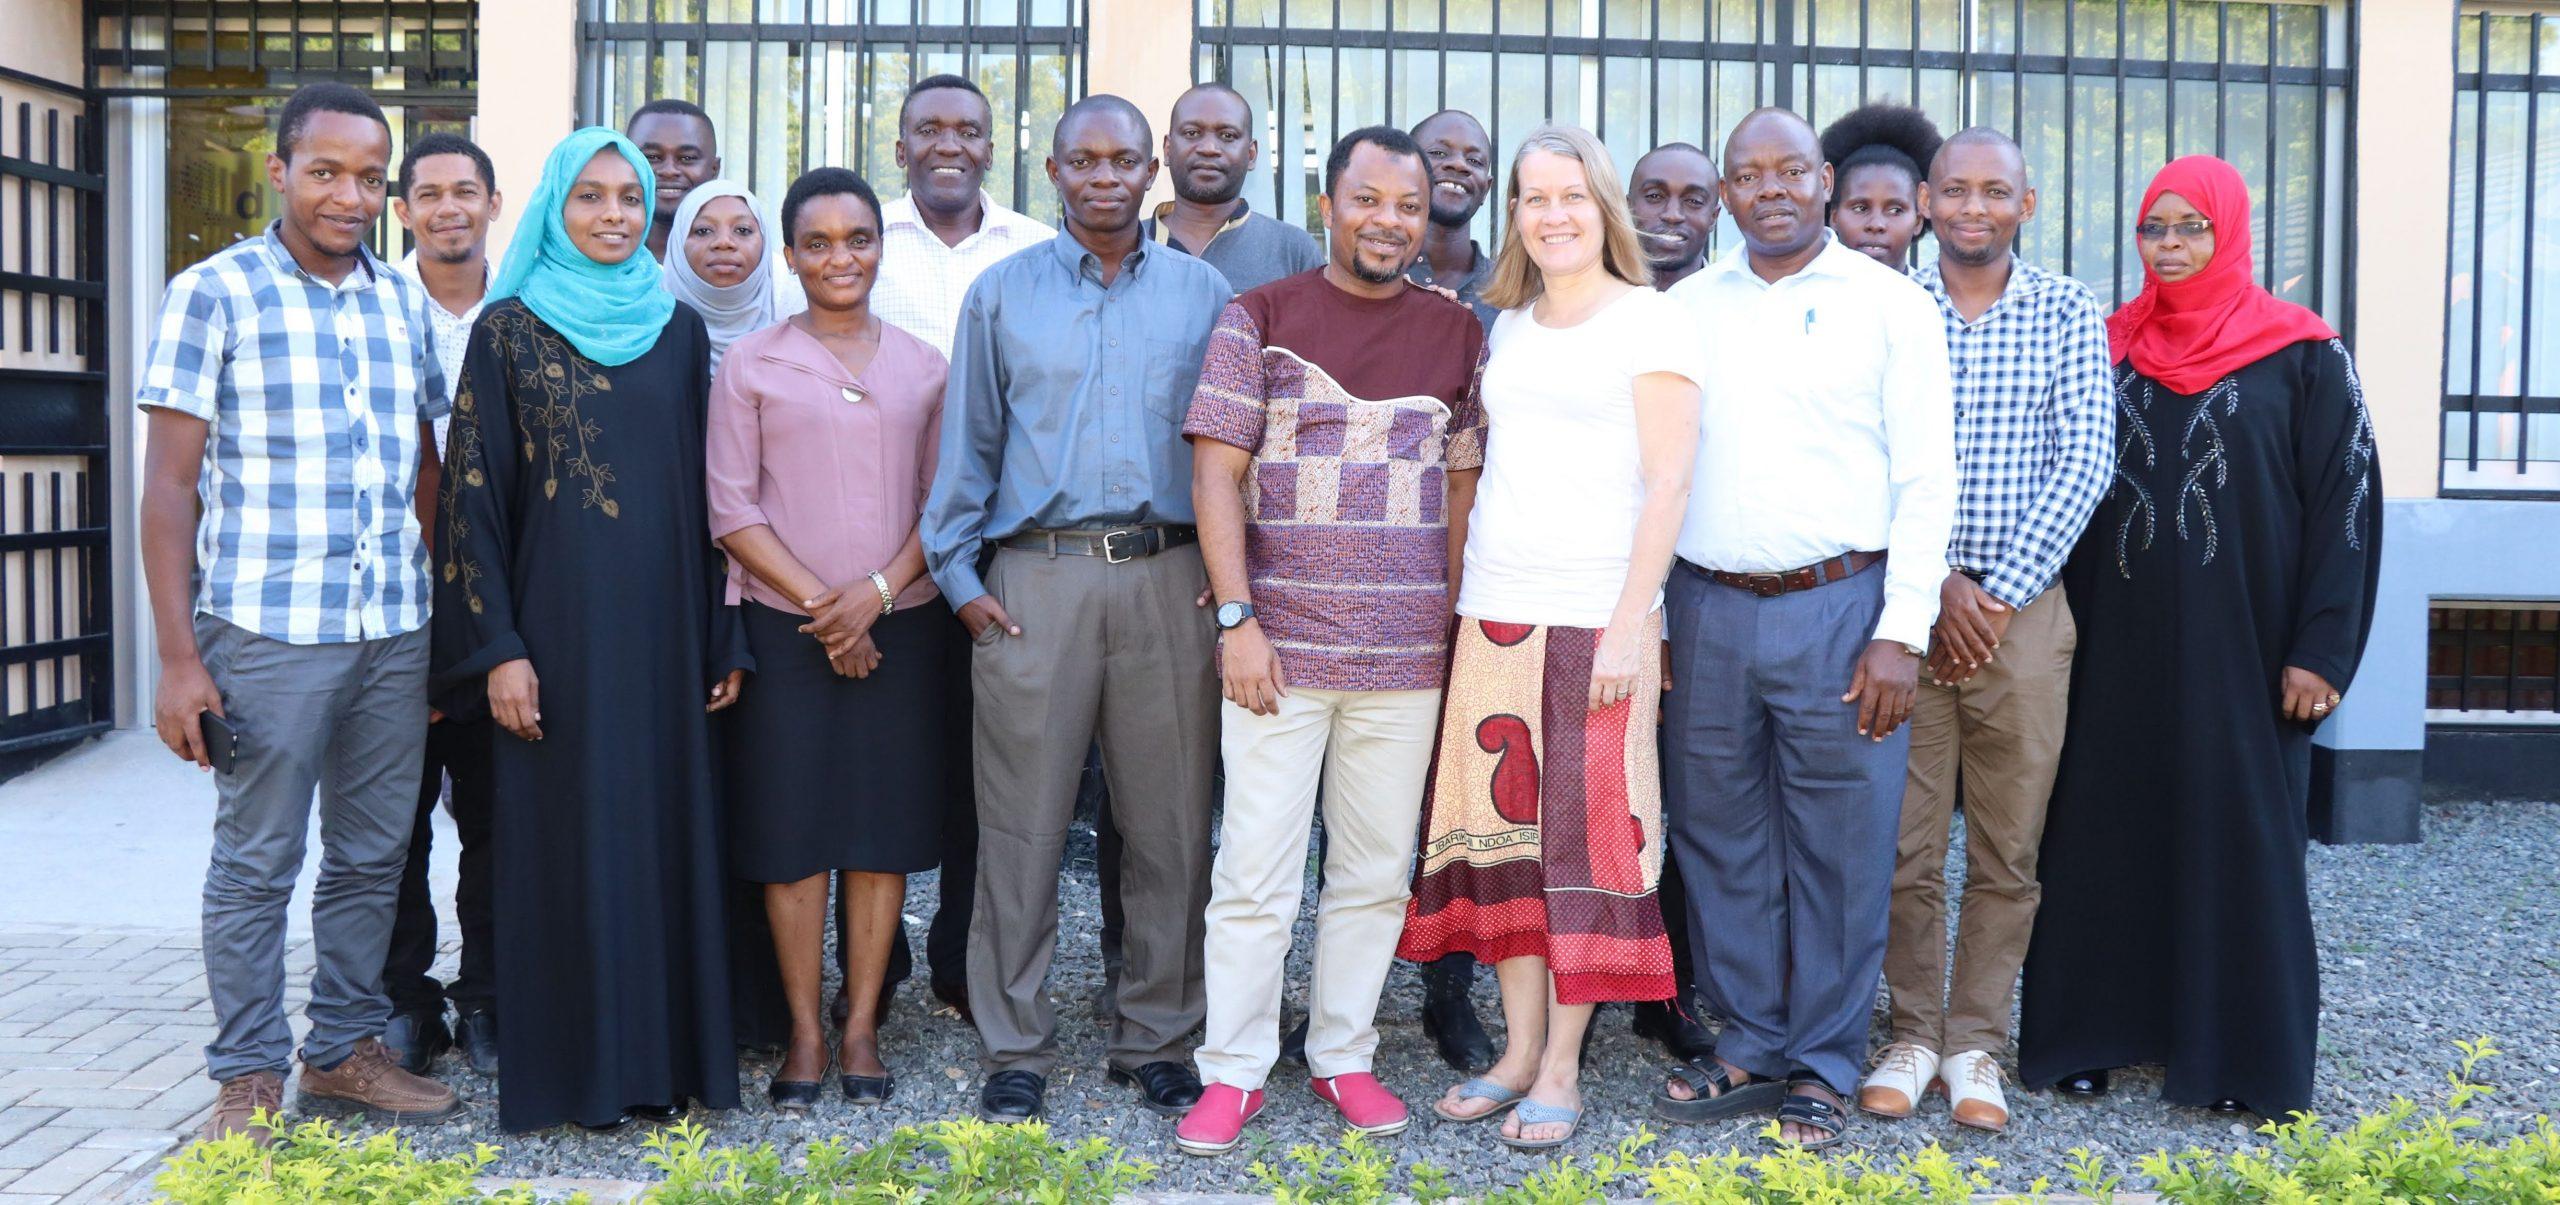 Group photo of University experts